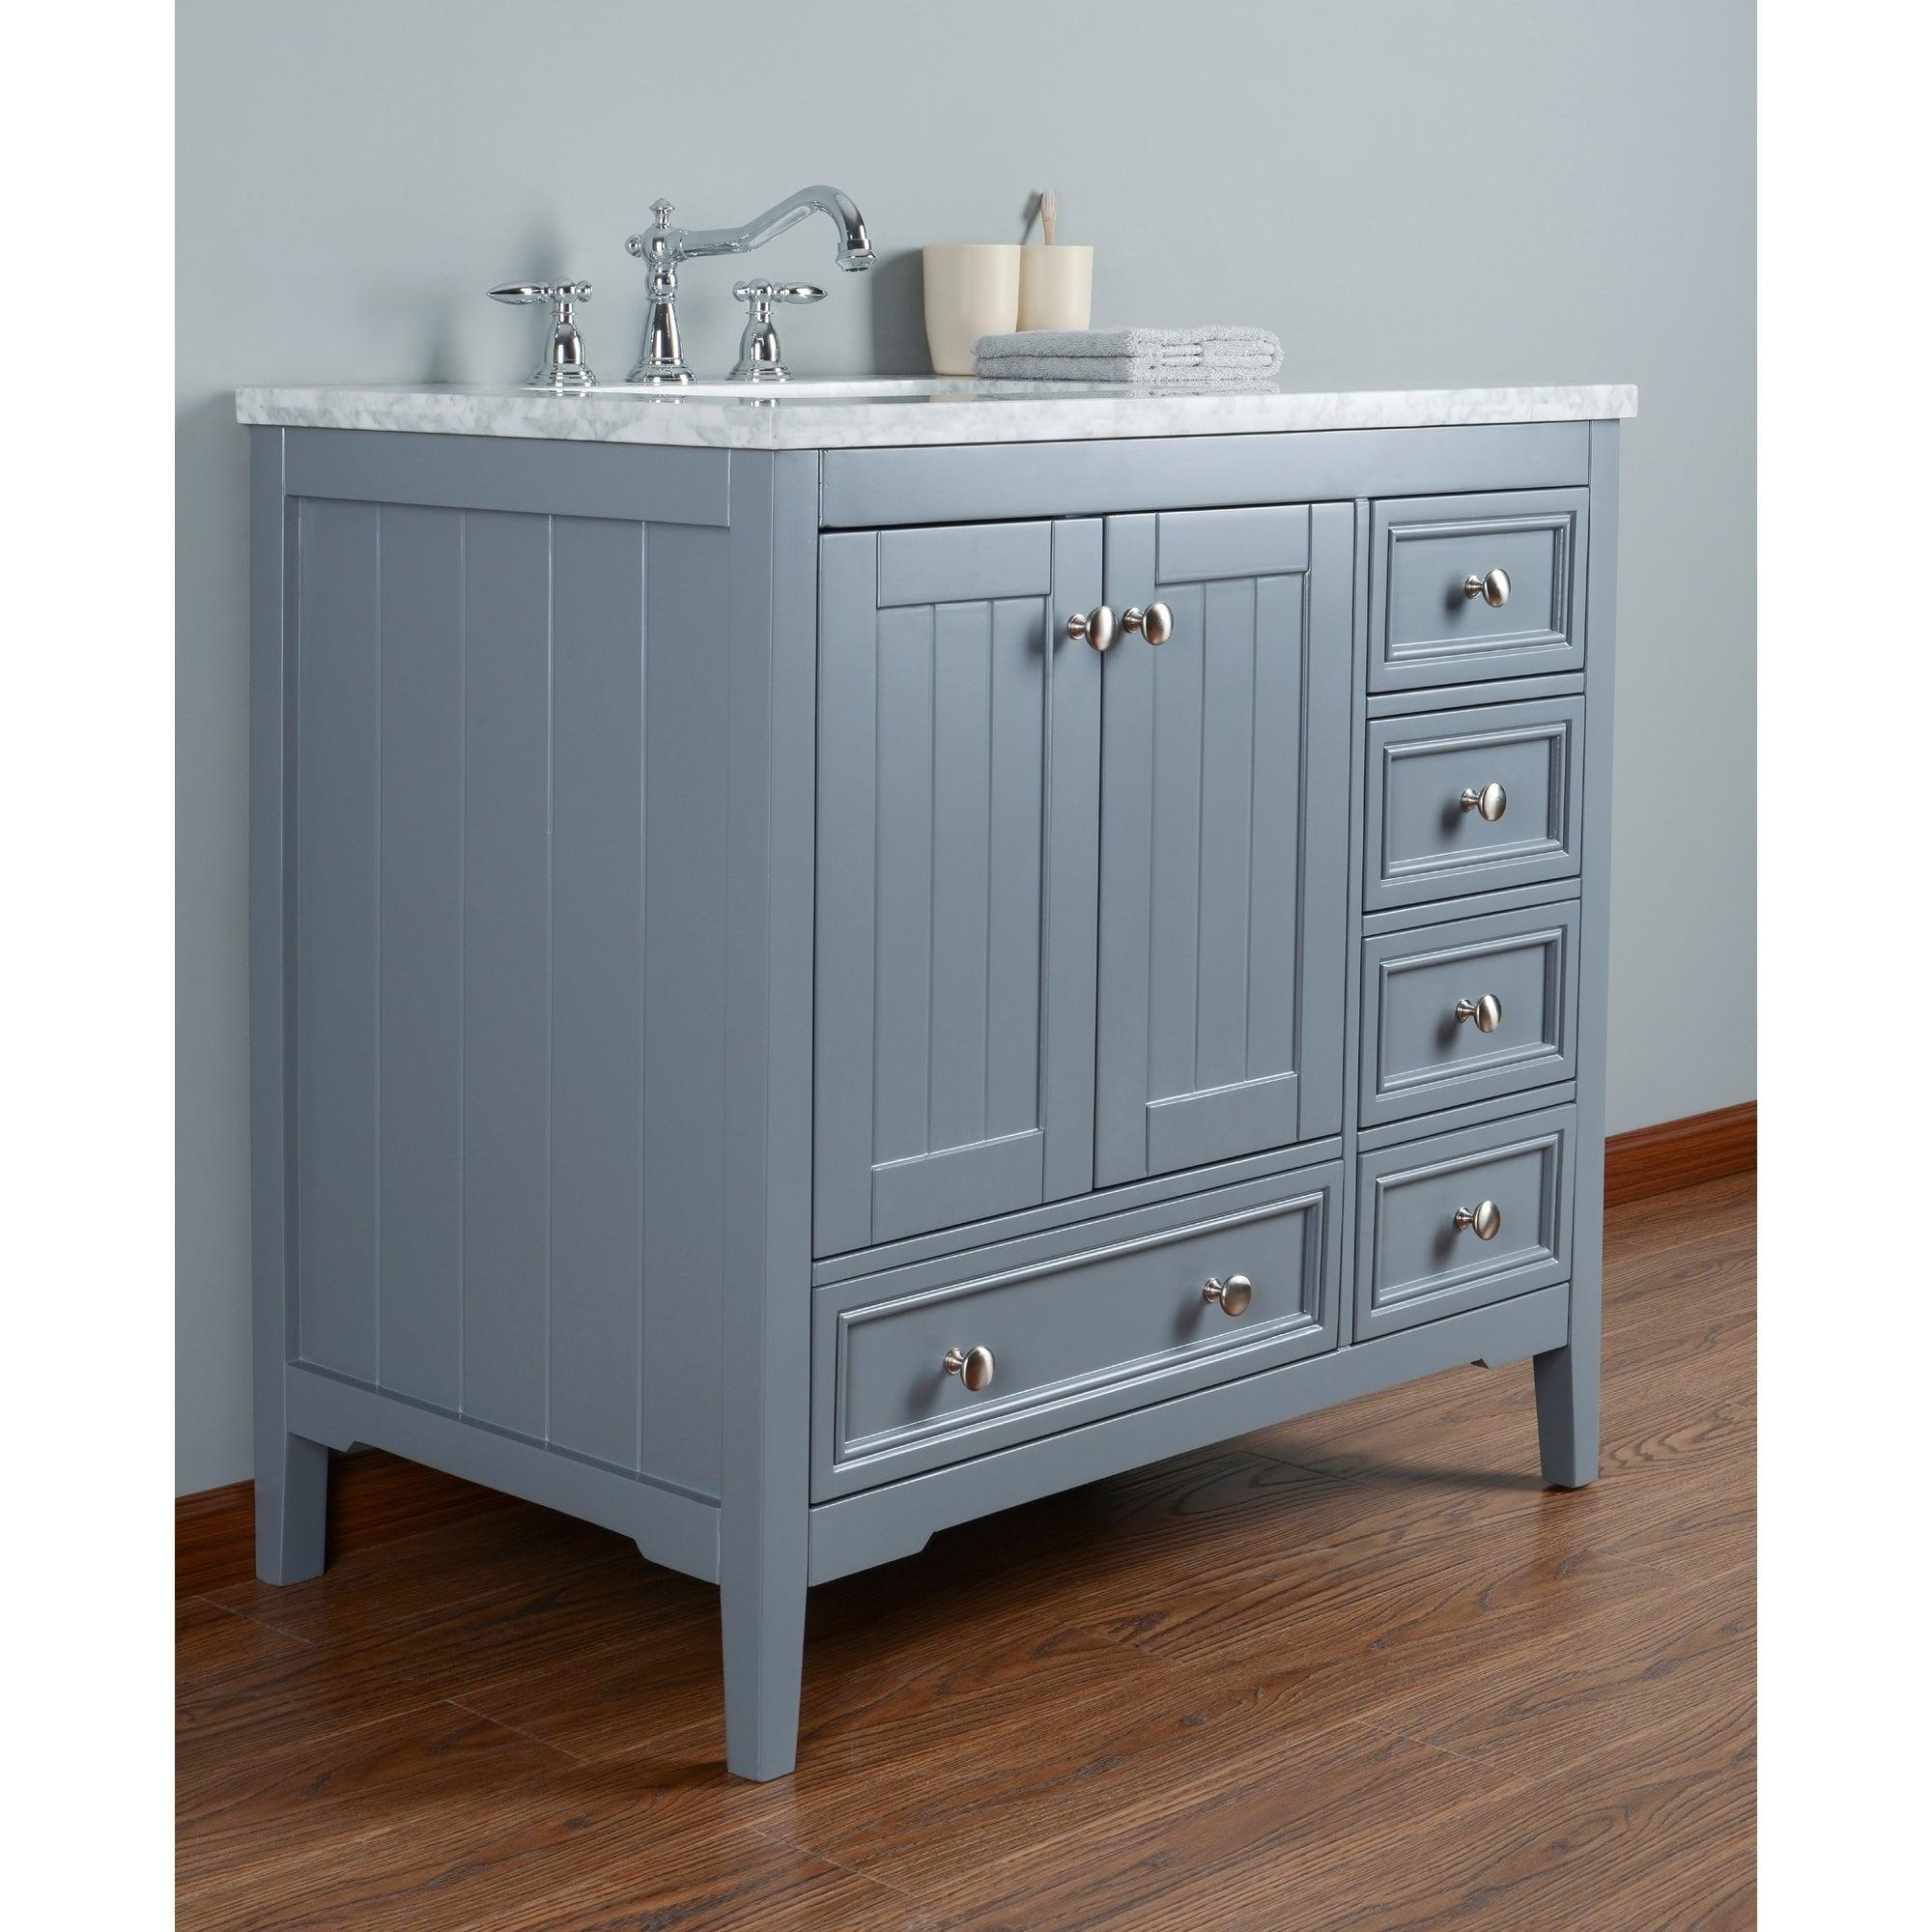 Shop Stufurhome New Yorker 36 Inches Grey Single Sink Bathroom ...